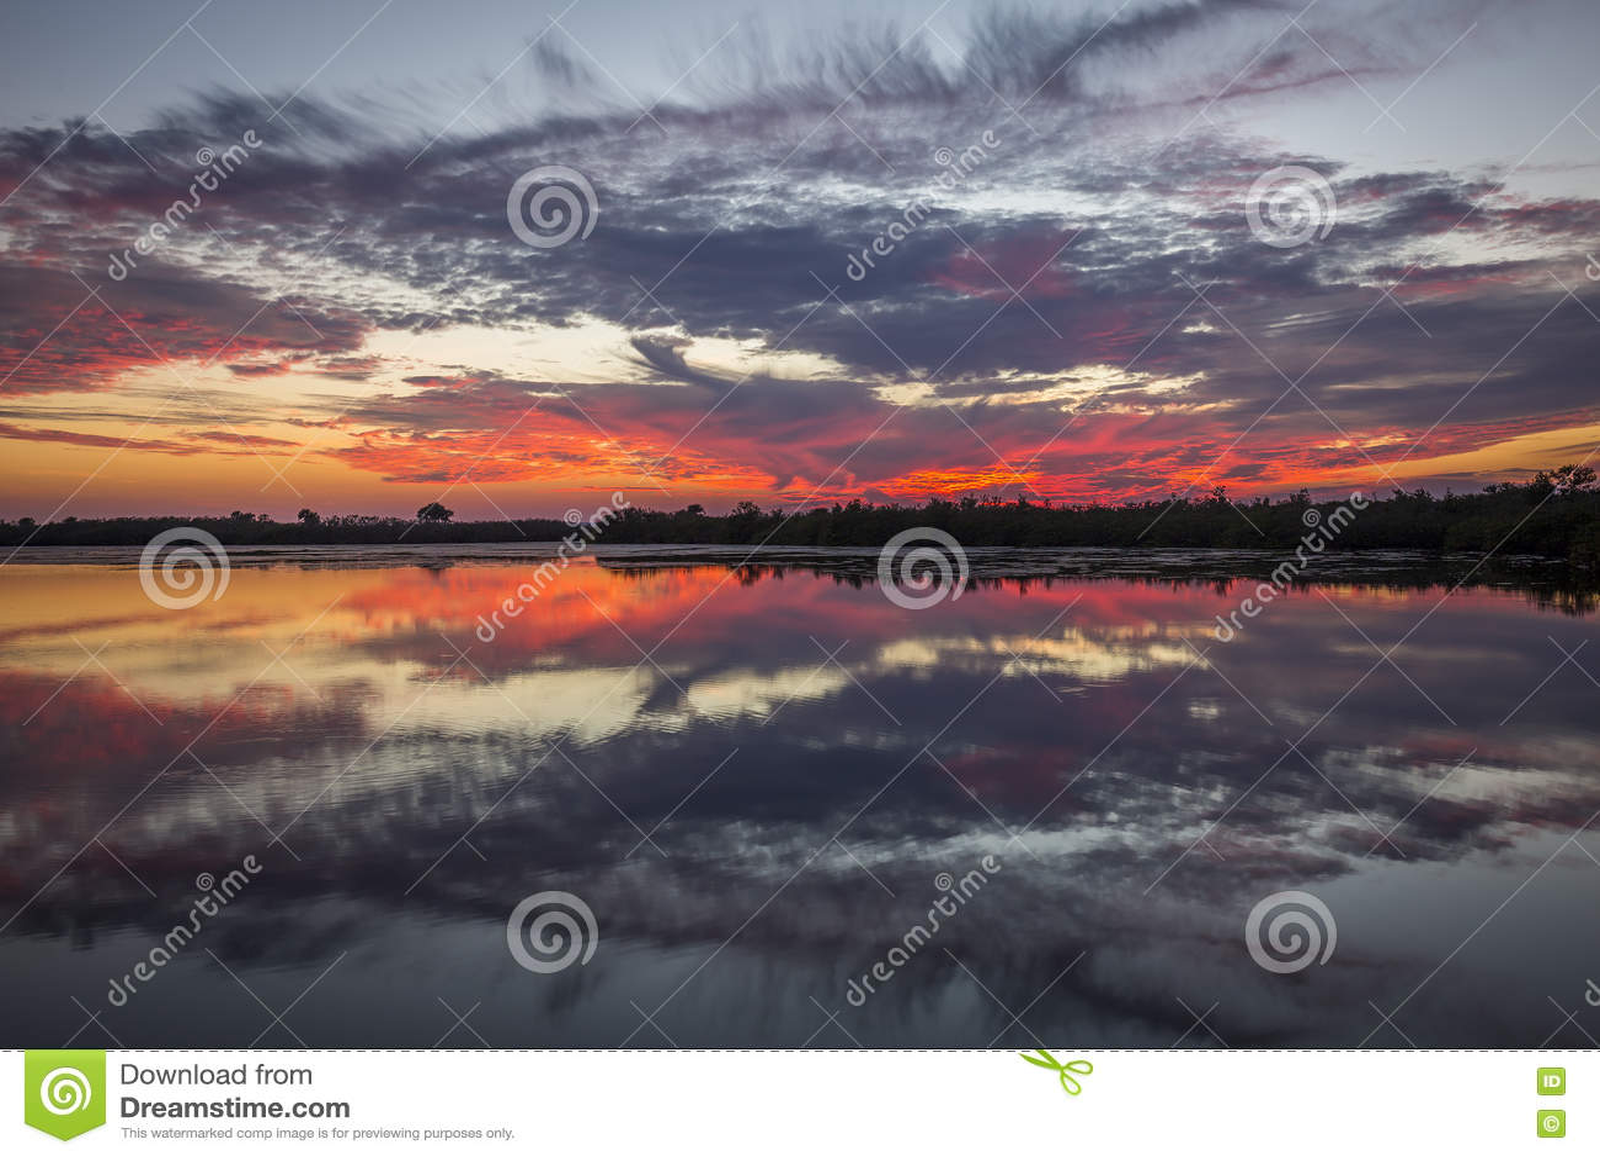 Sunset over water - Merritt Island Wildlife Refuge, Florida